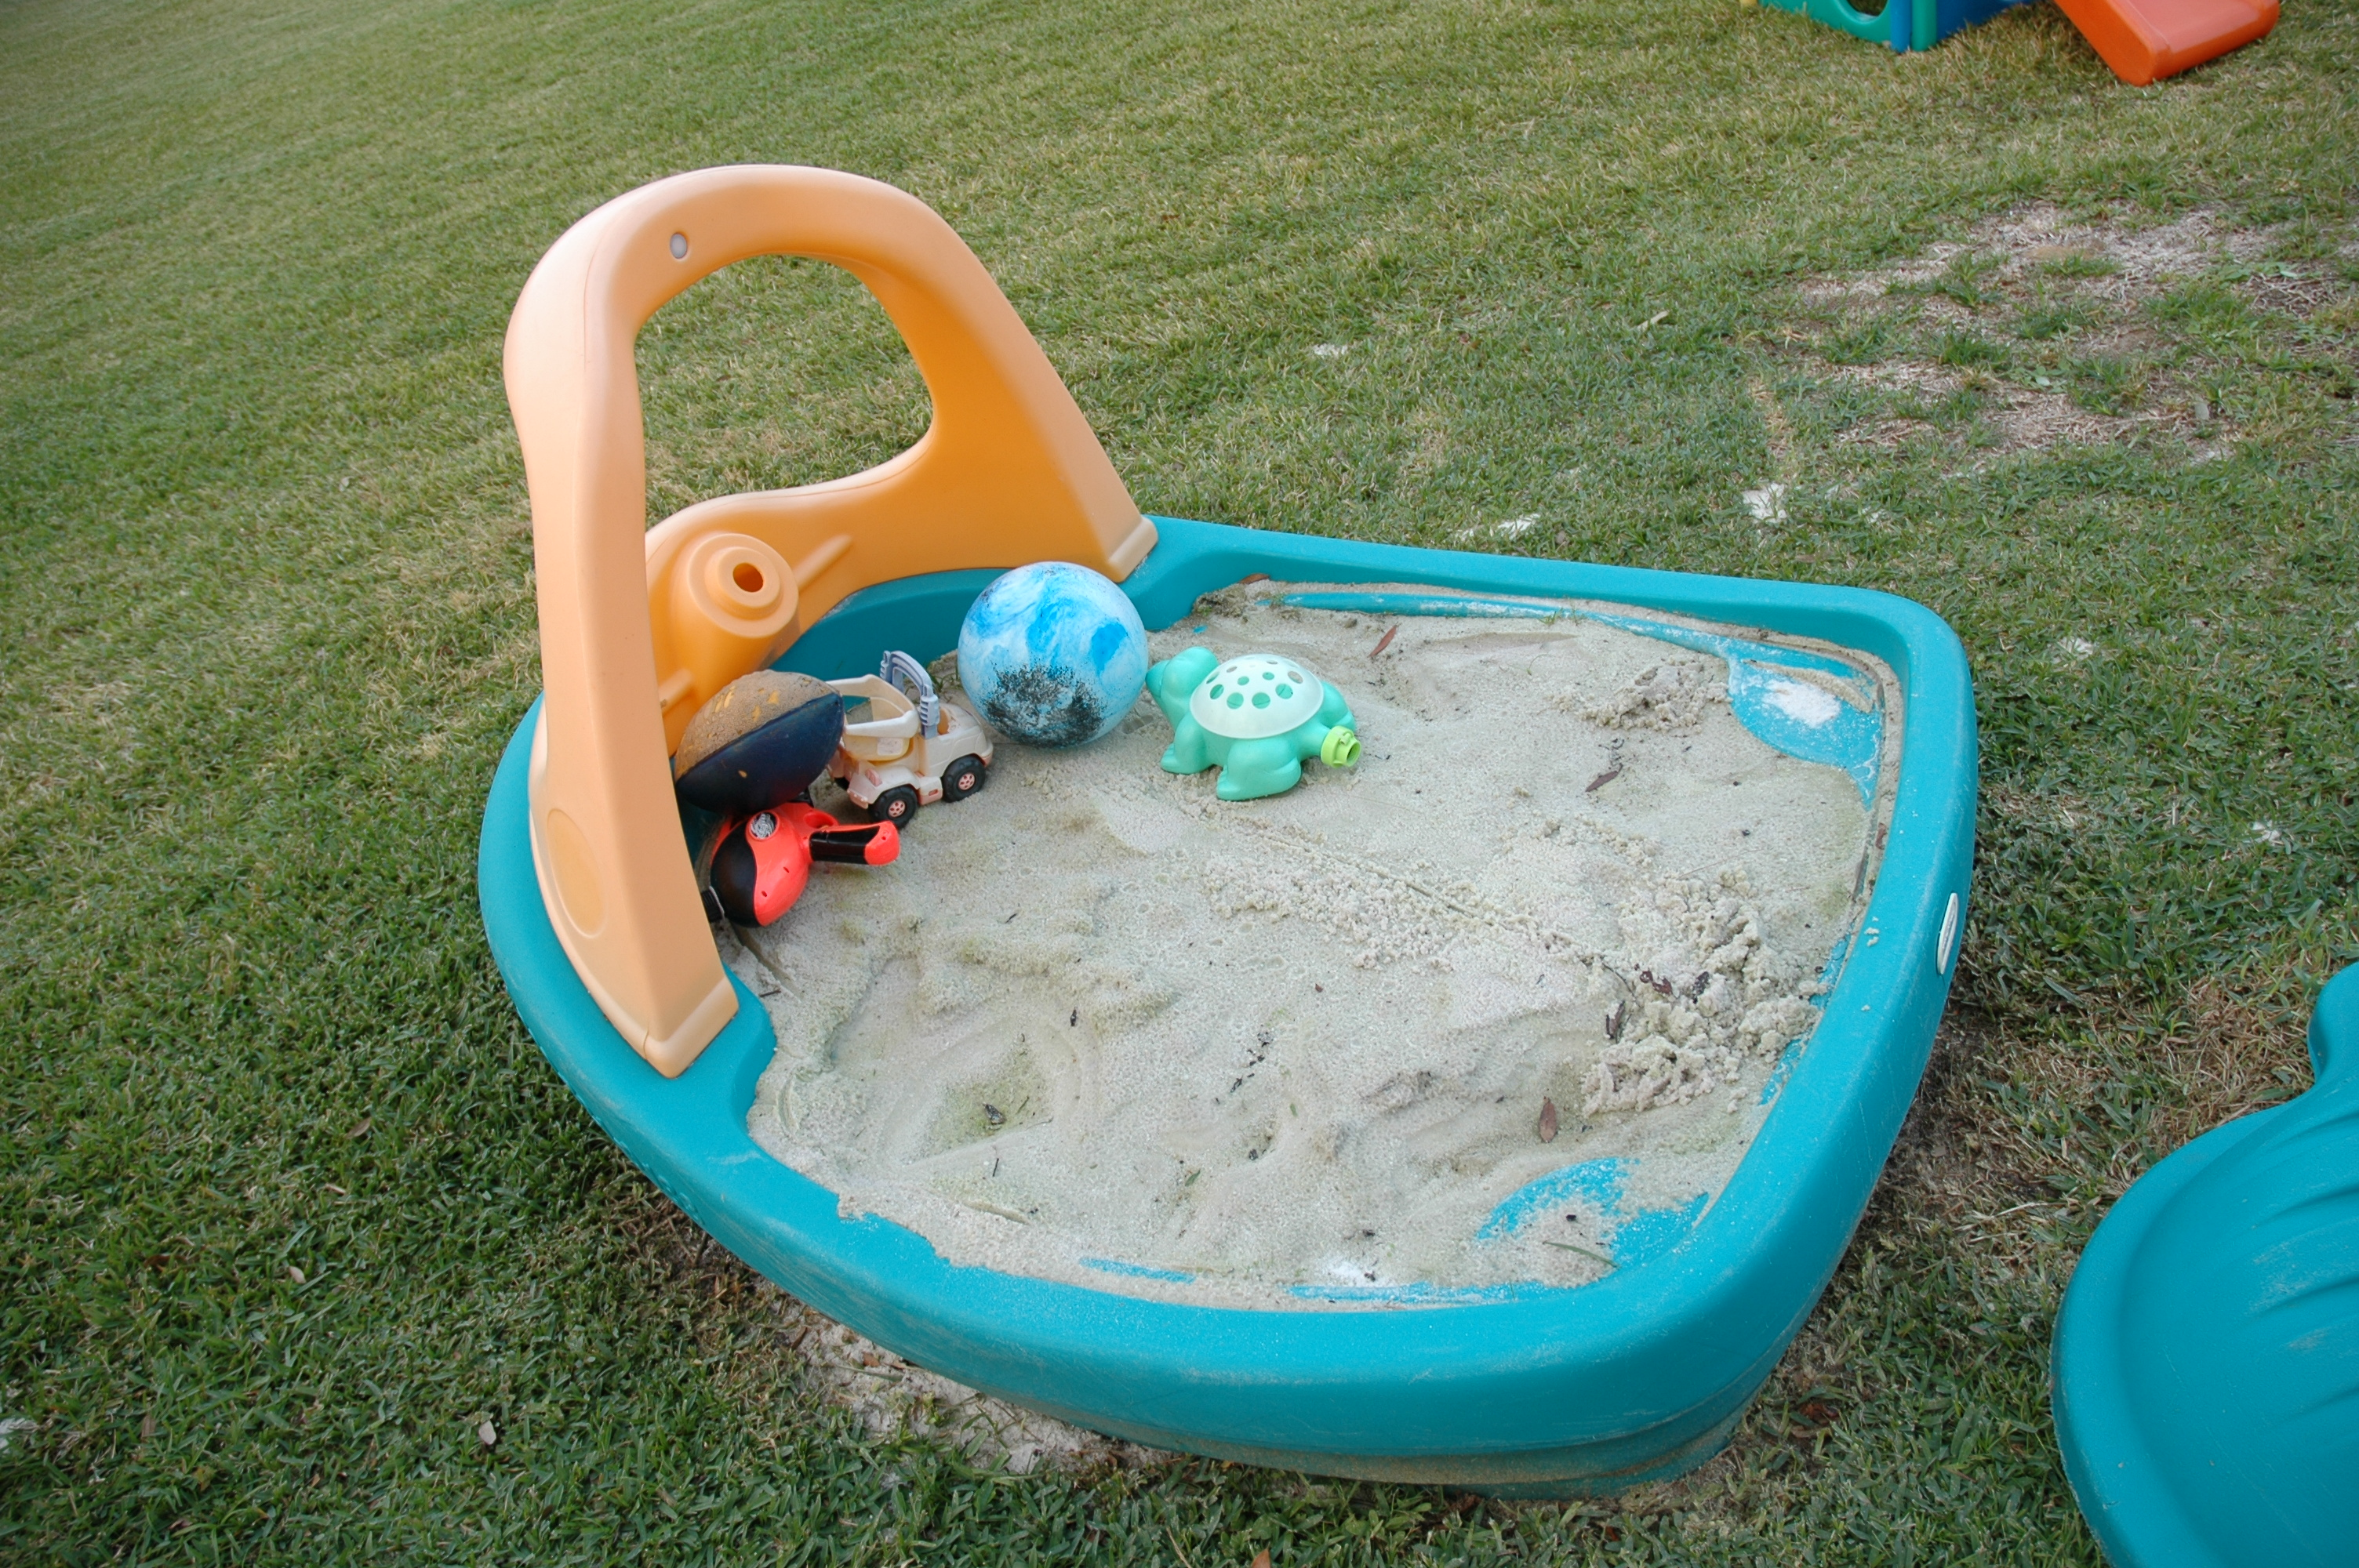 File:Boat sandbox sandpit.JPG - Wikipedia